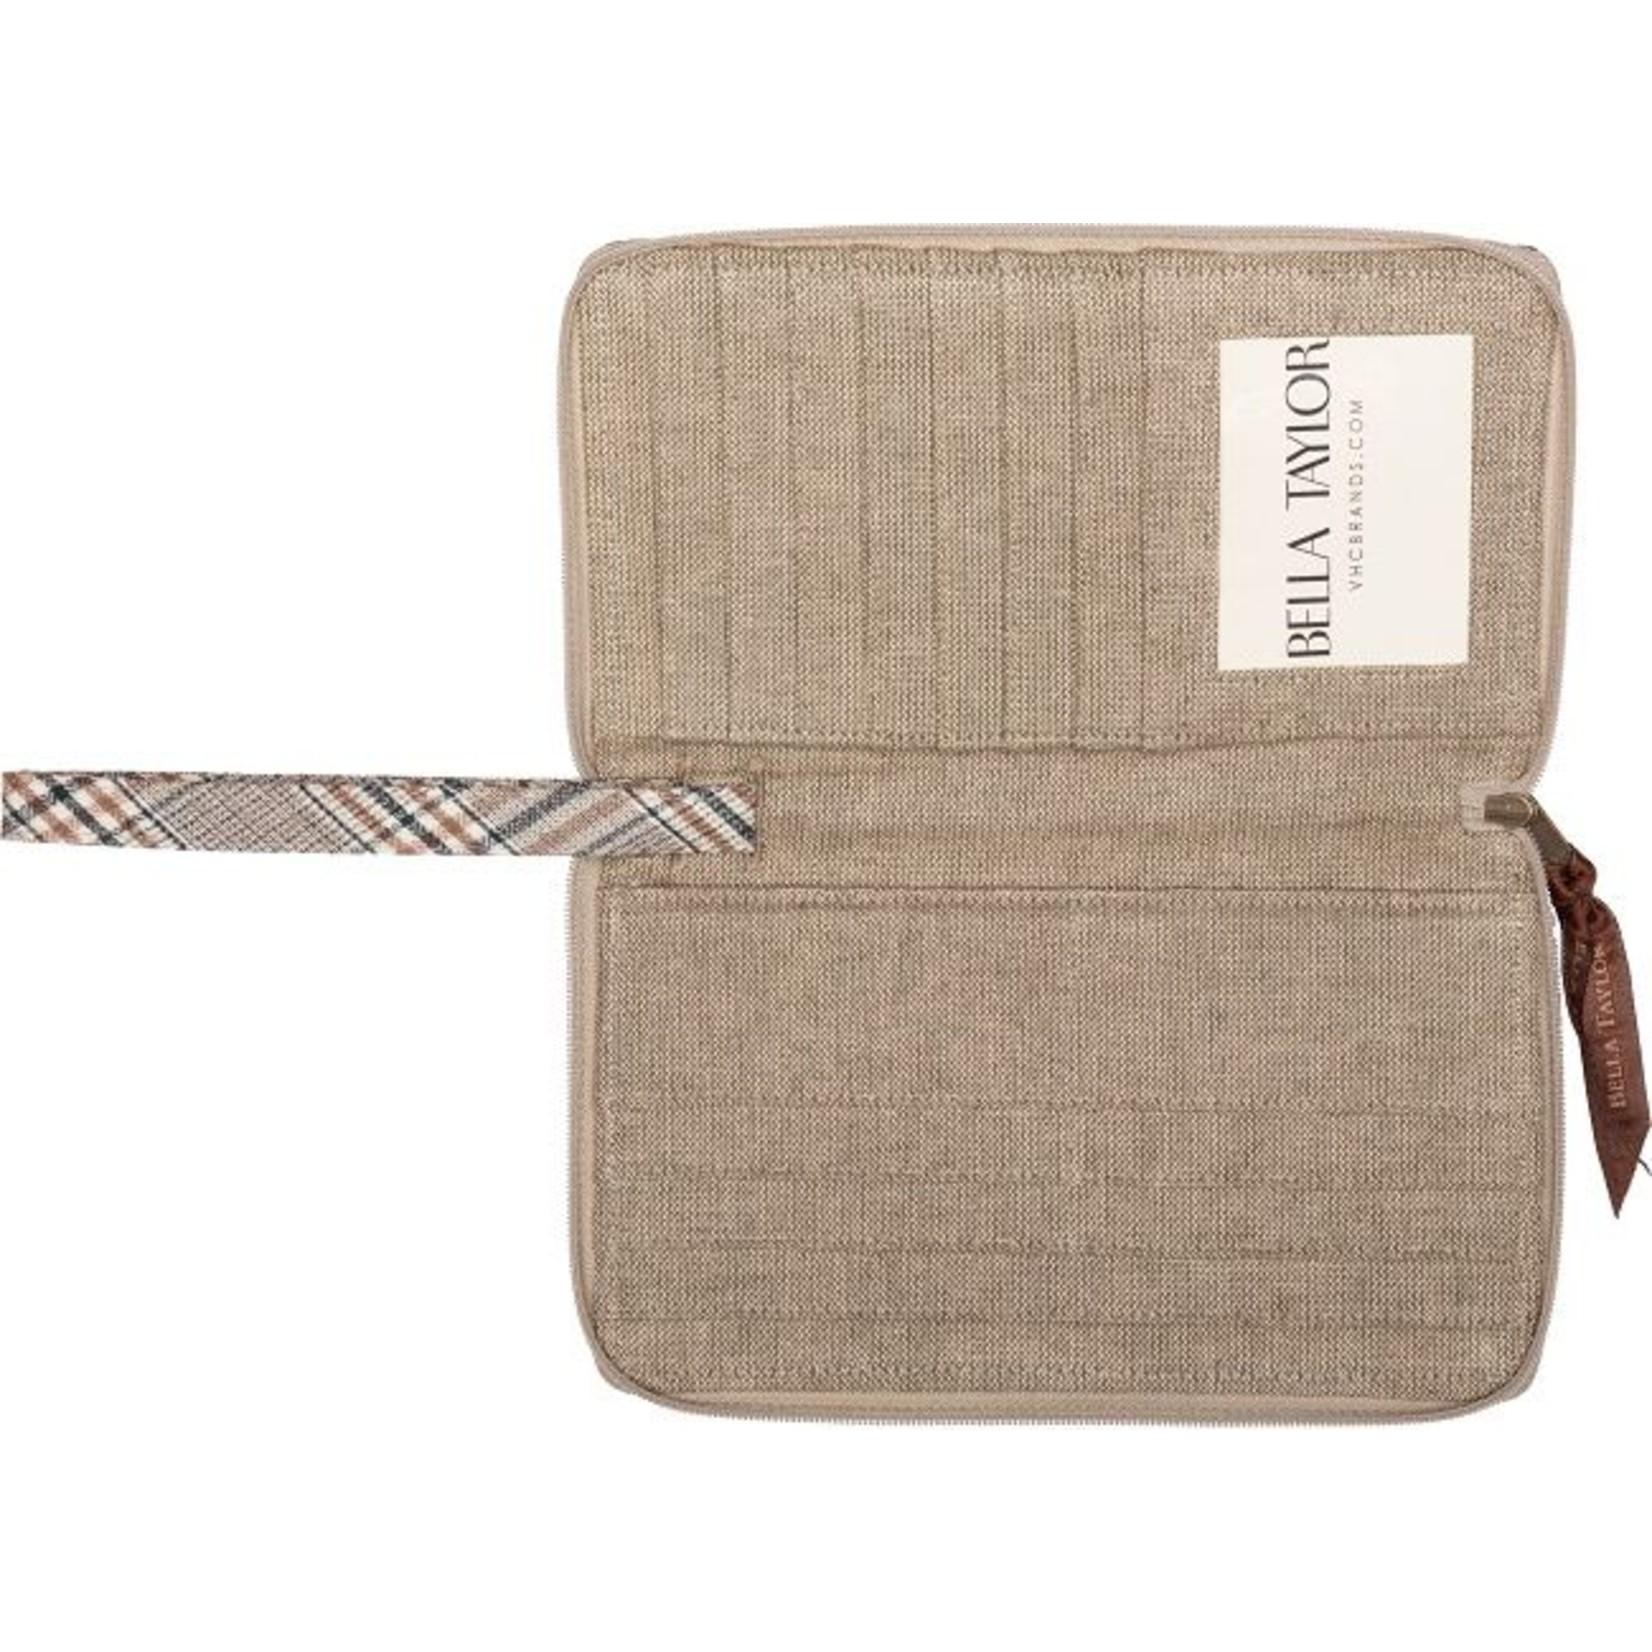 Bella Taylor Rory - Wrist Strap Wallet